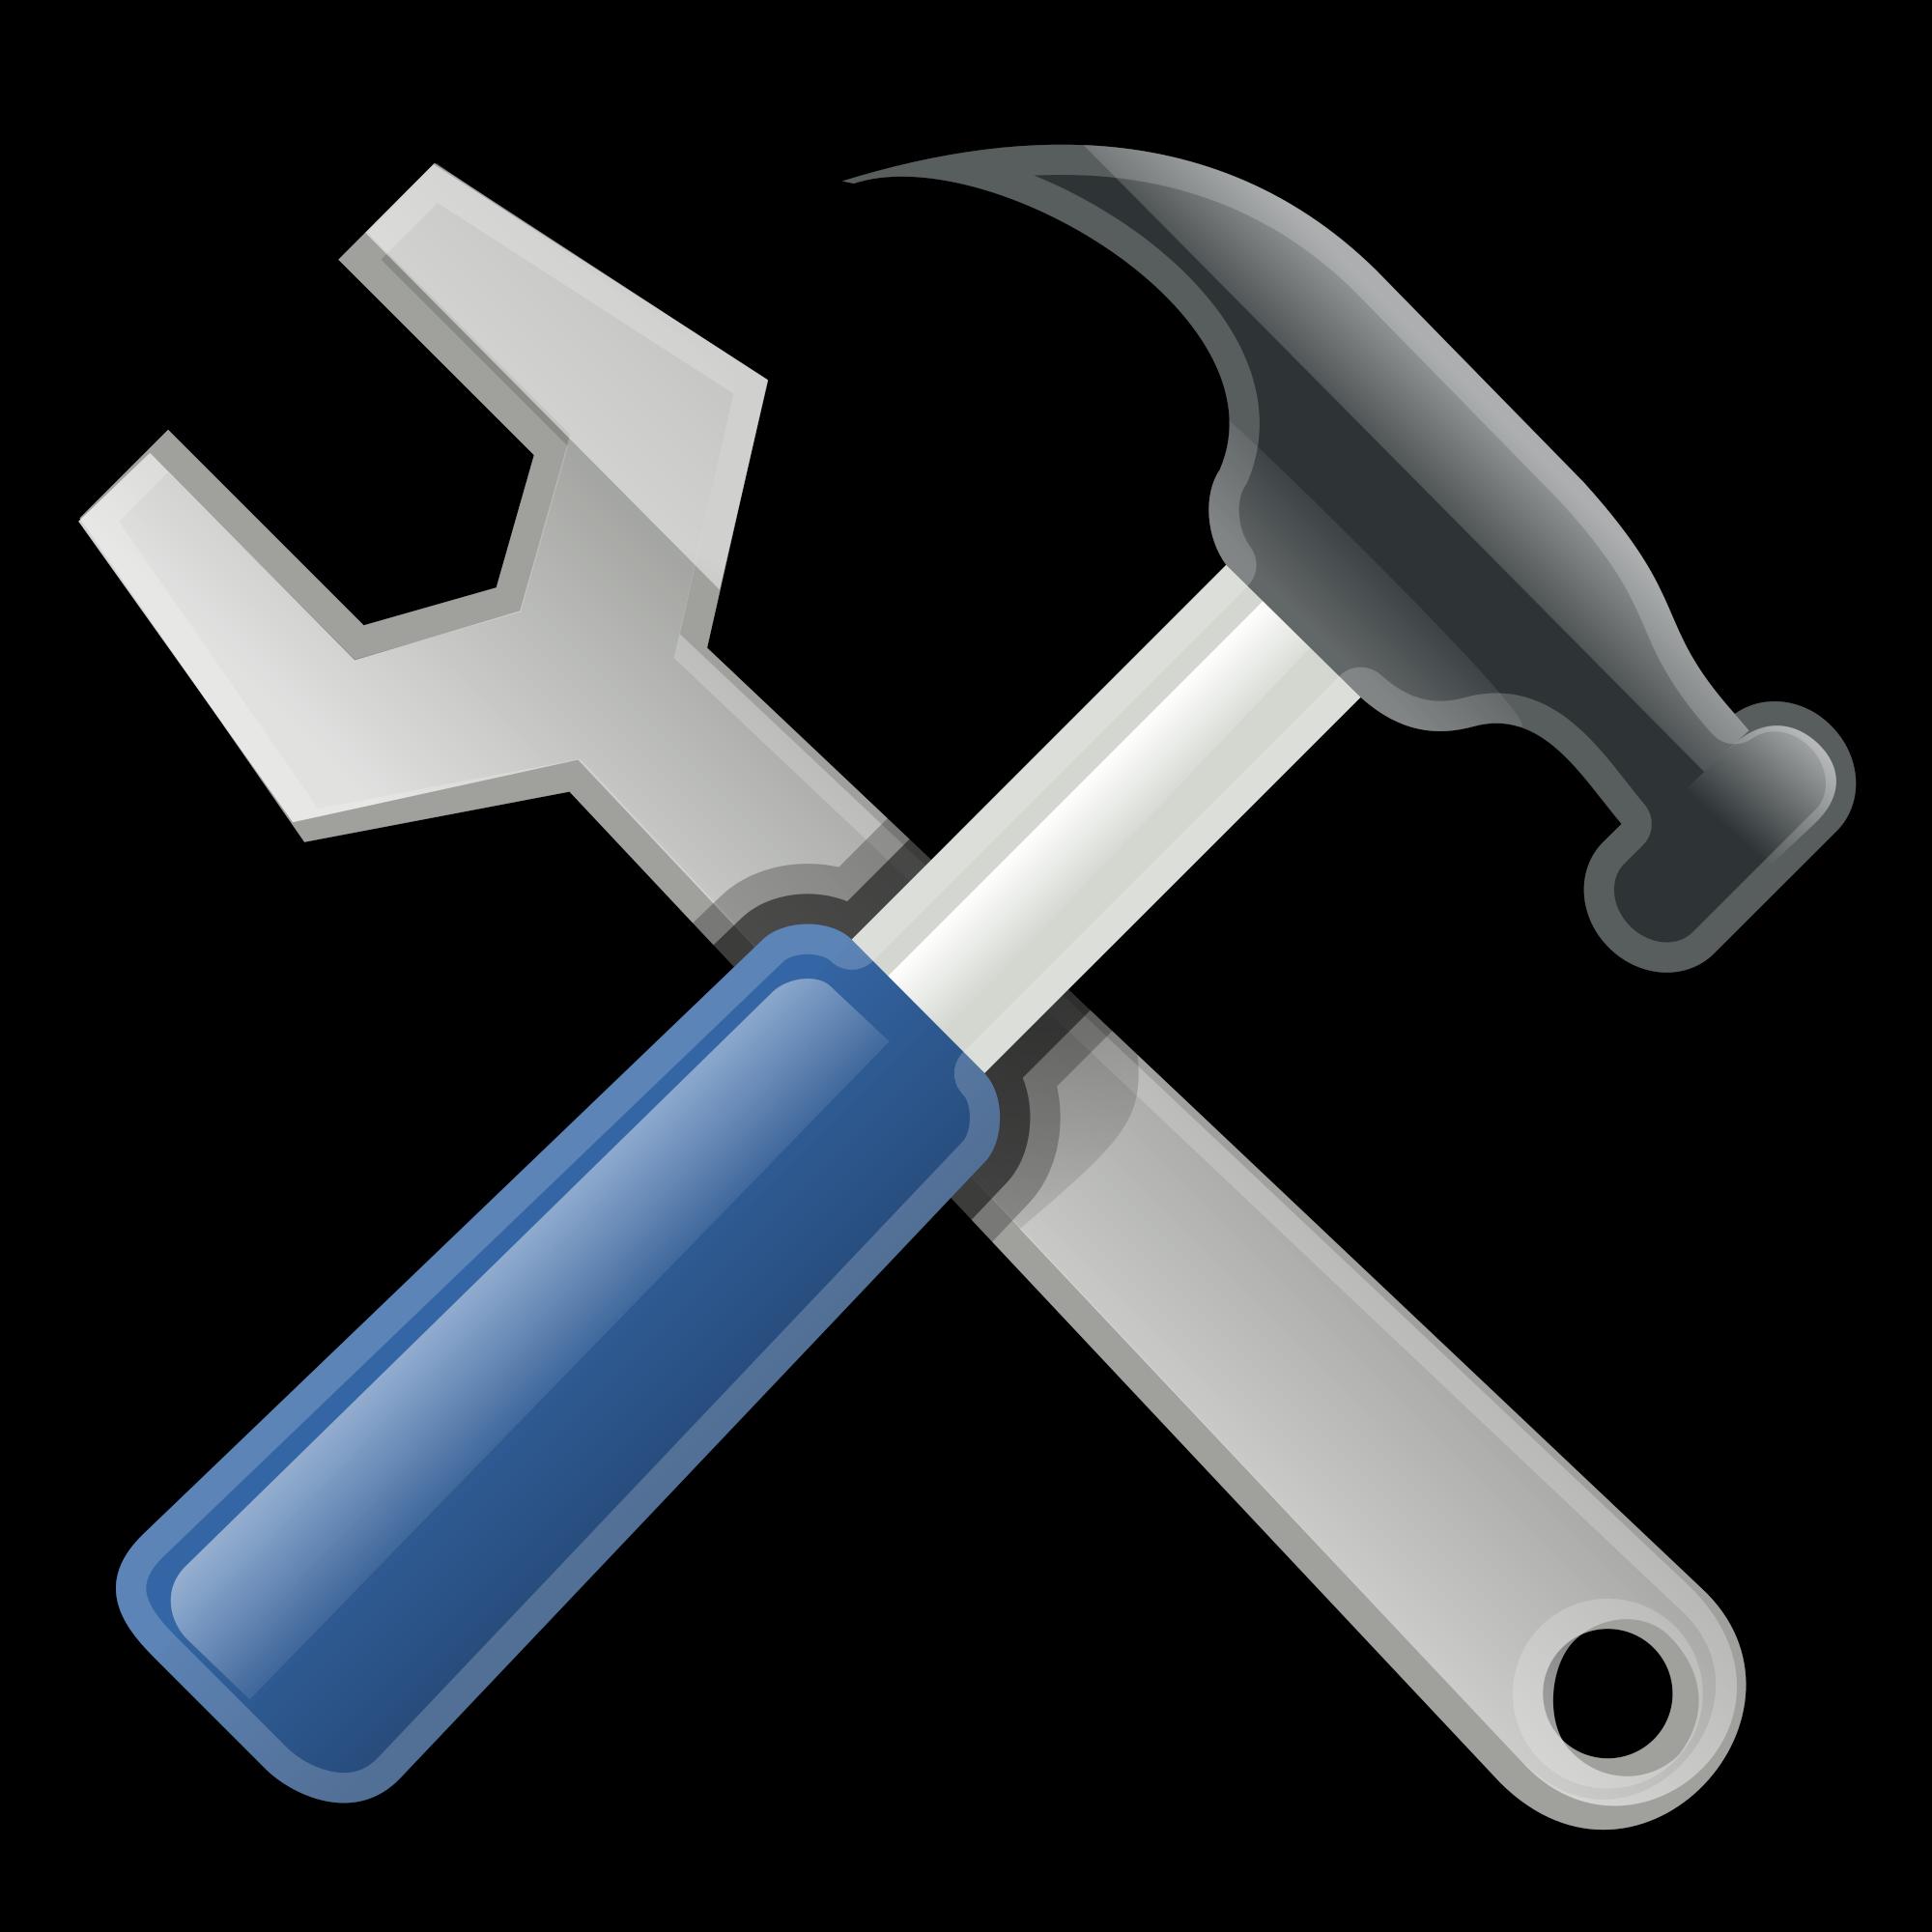 Tool PNG - 1236